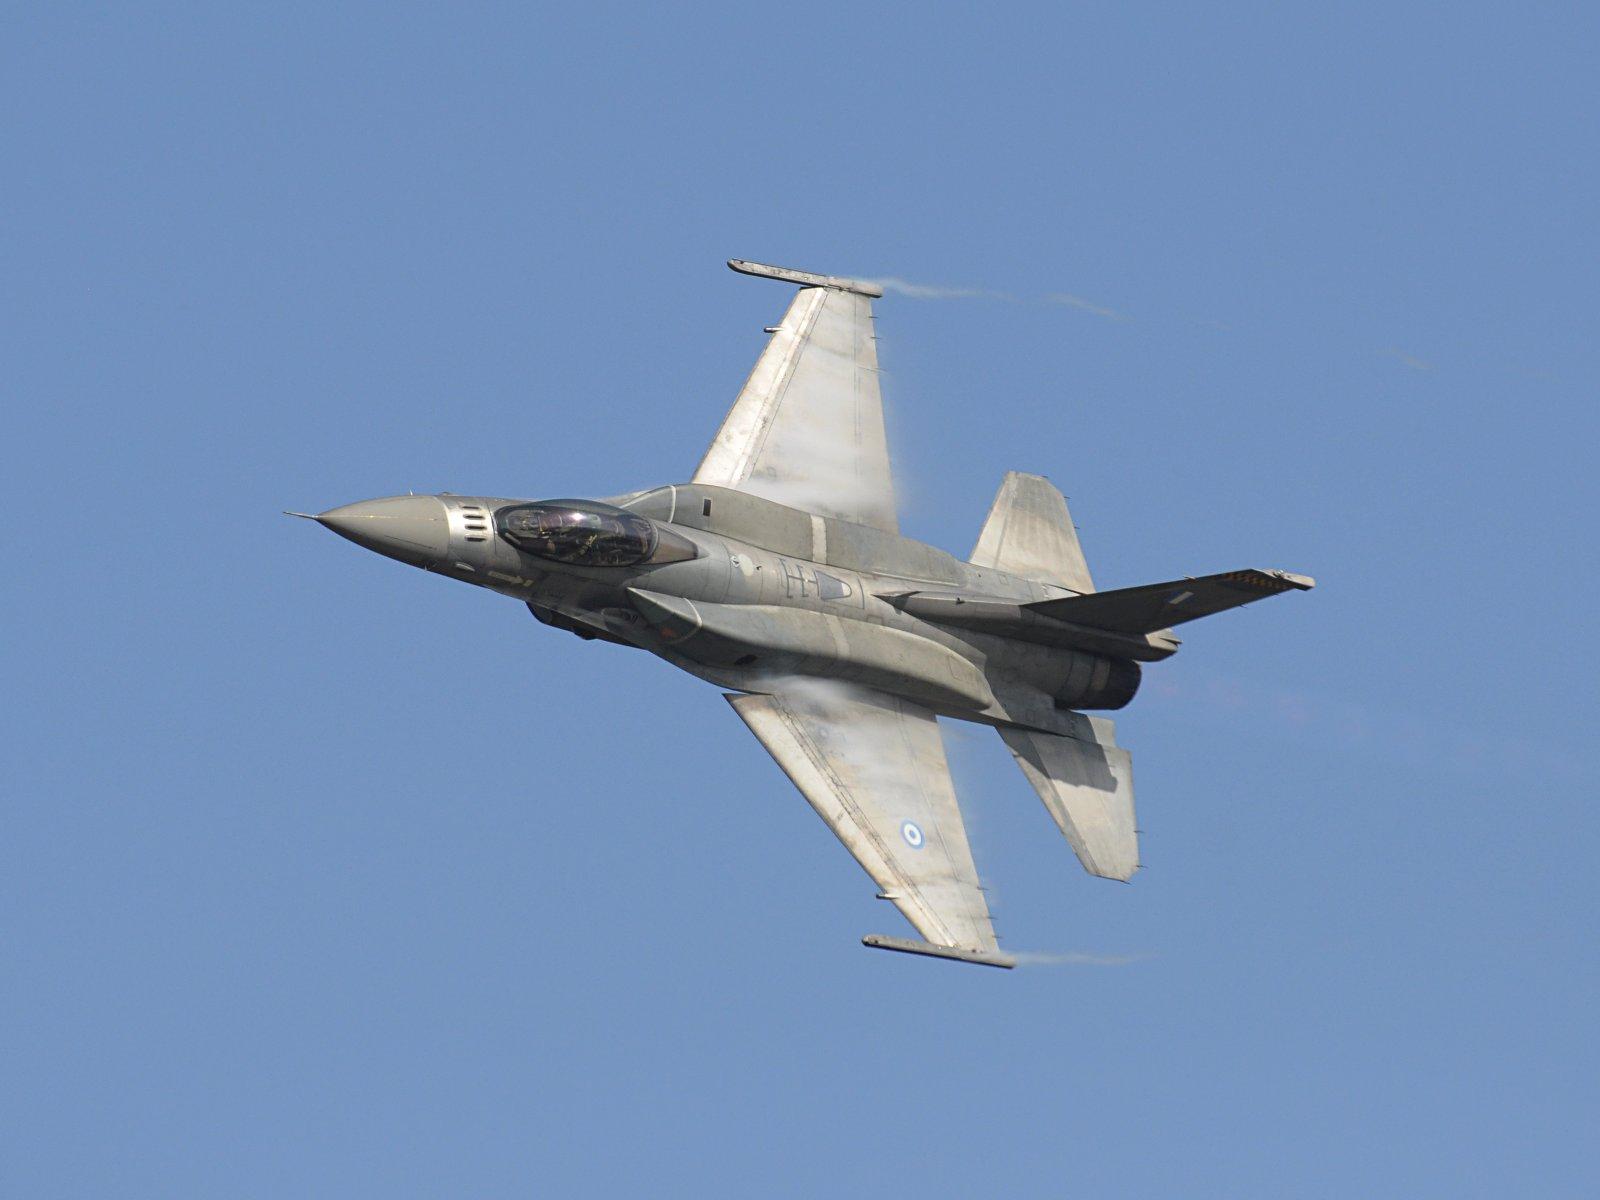 Jets images